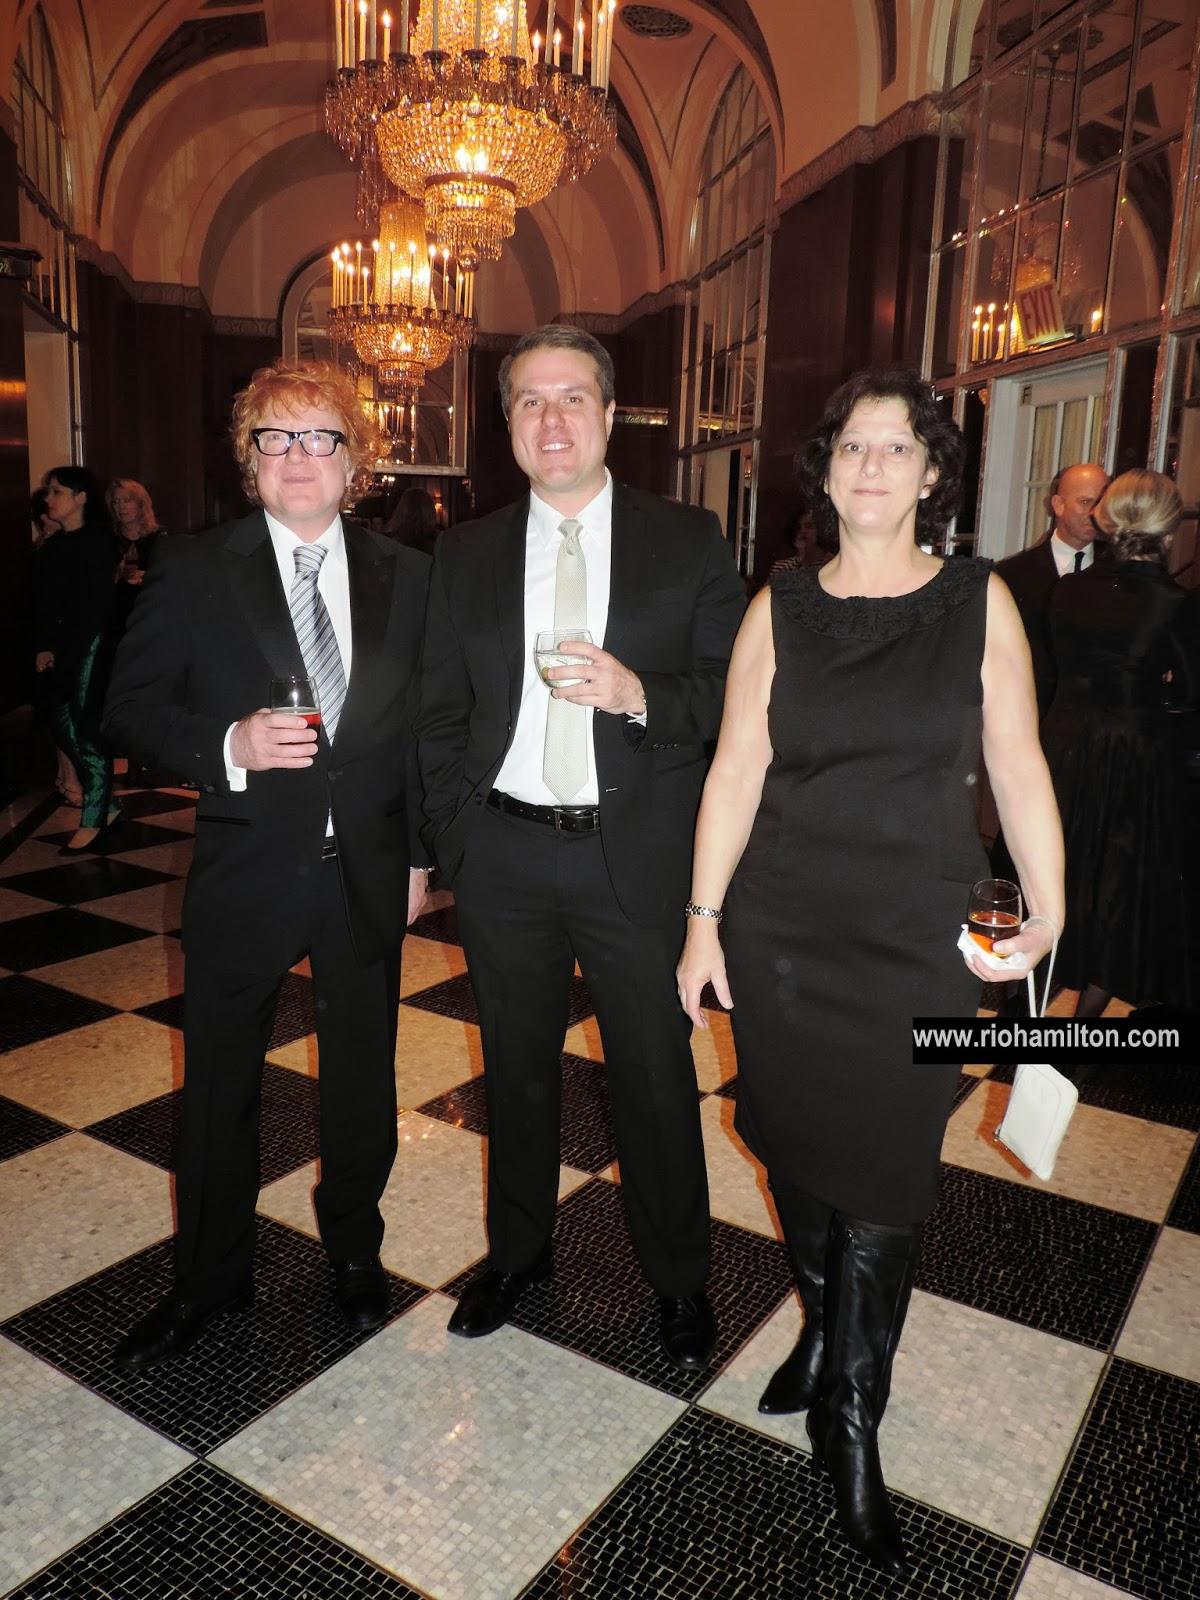 Thats Norm Standing Between Kirk Heasley And Joan Bucci